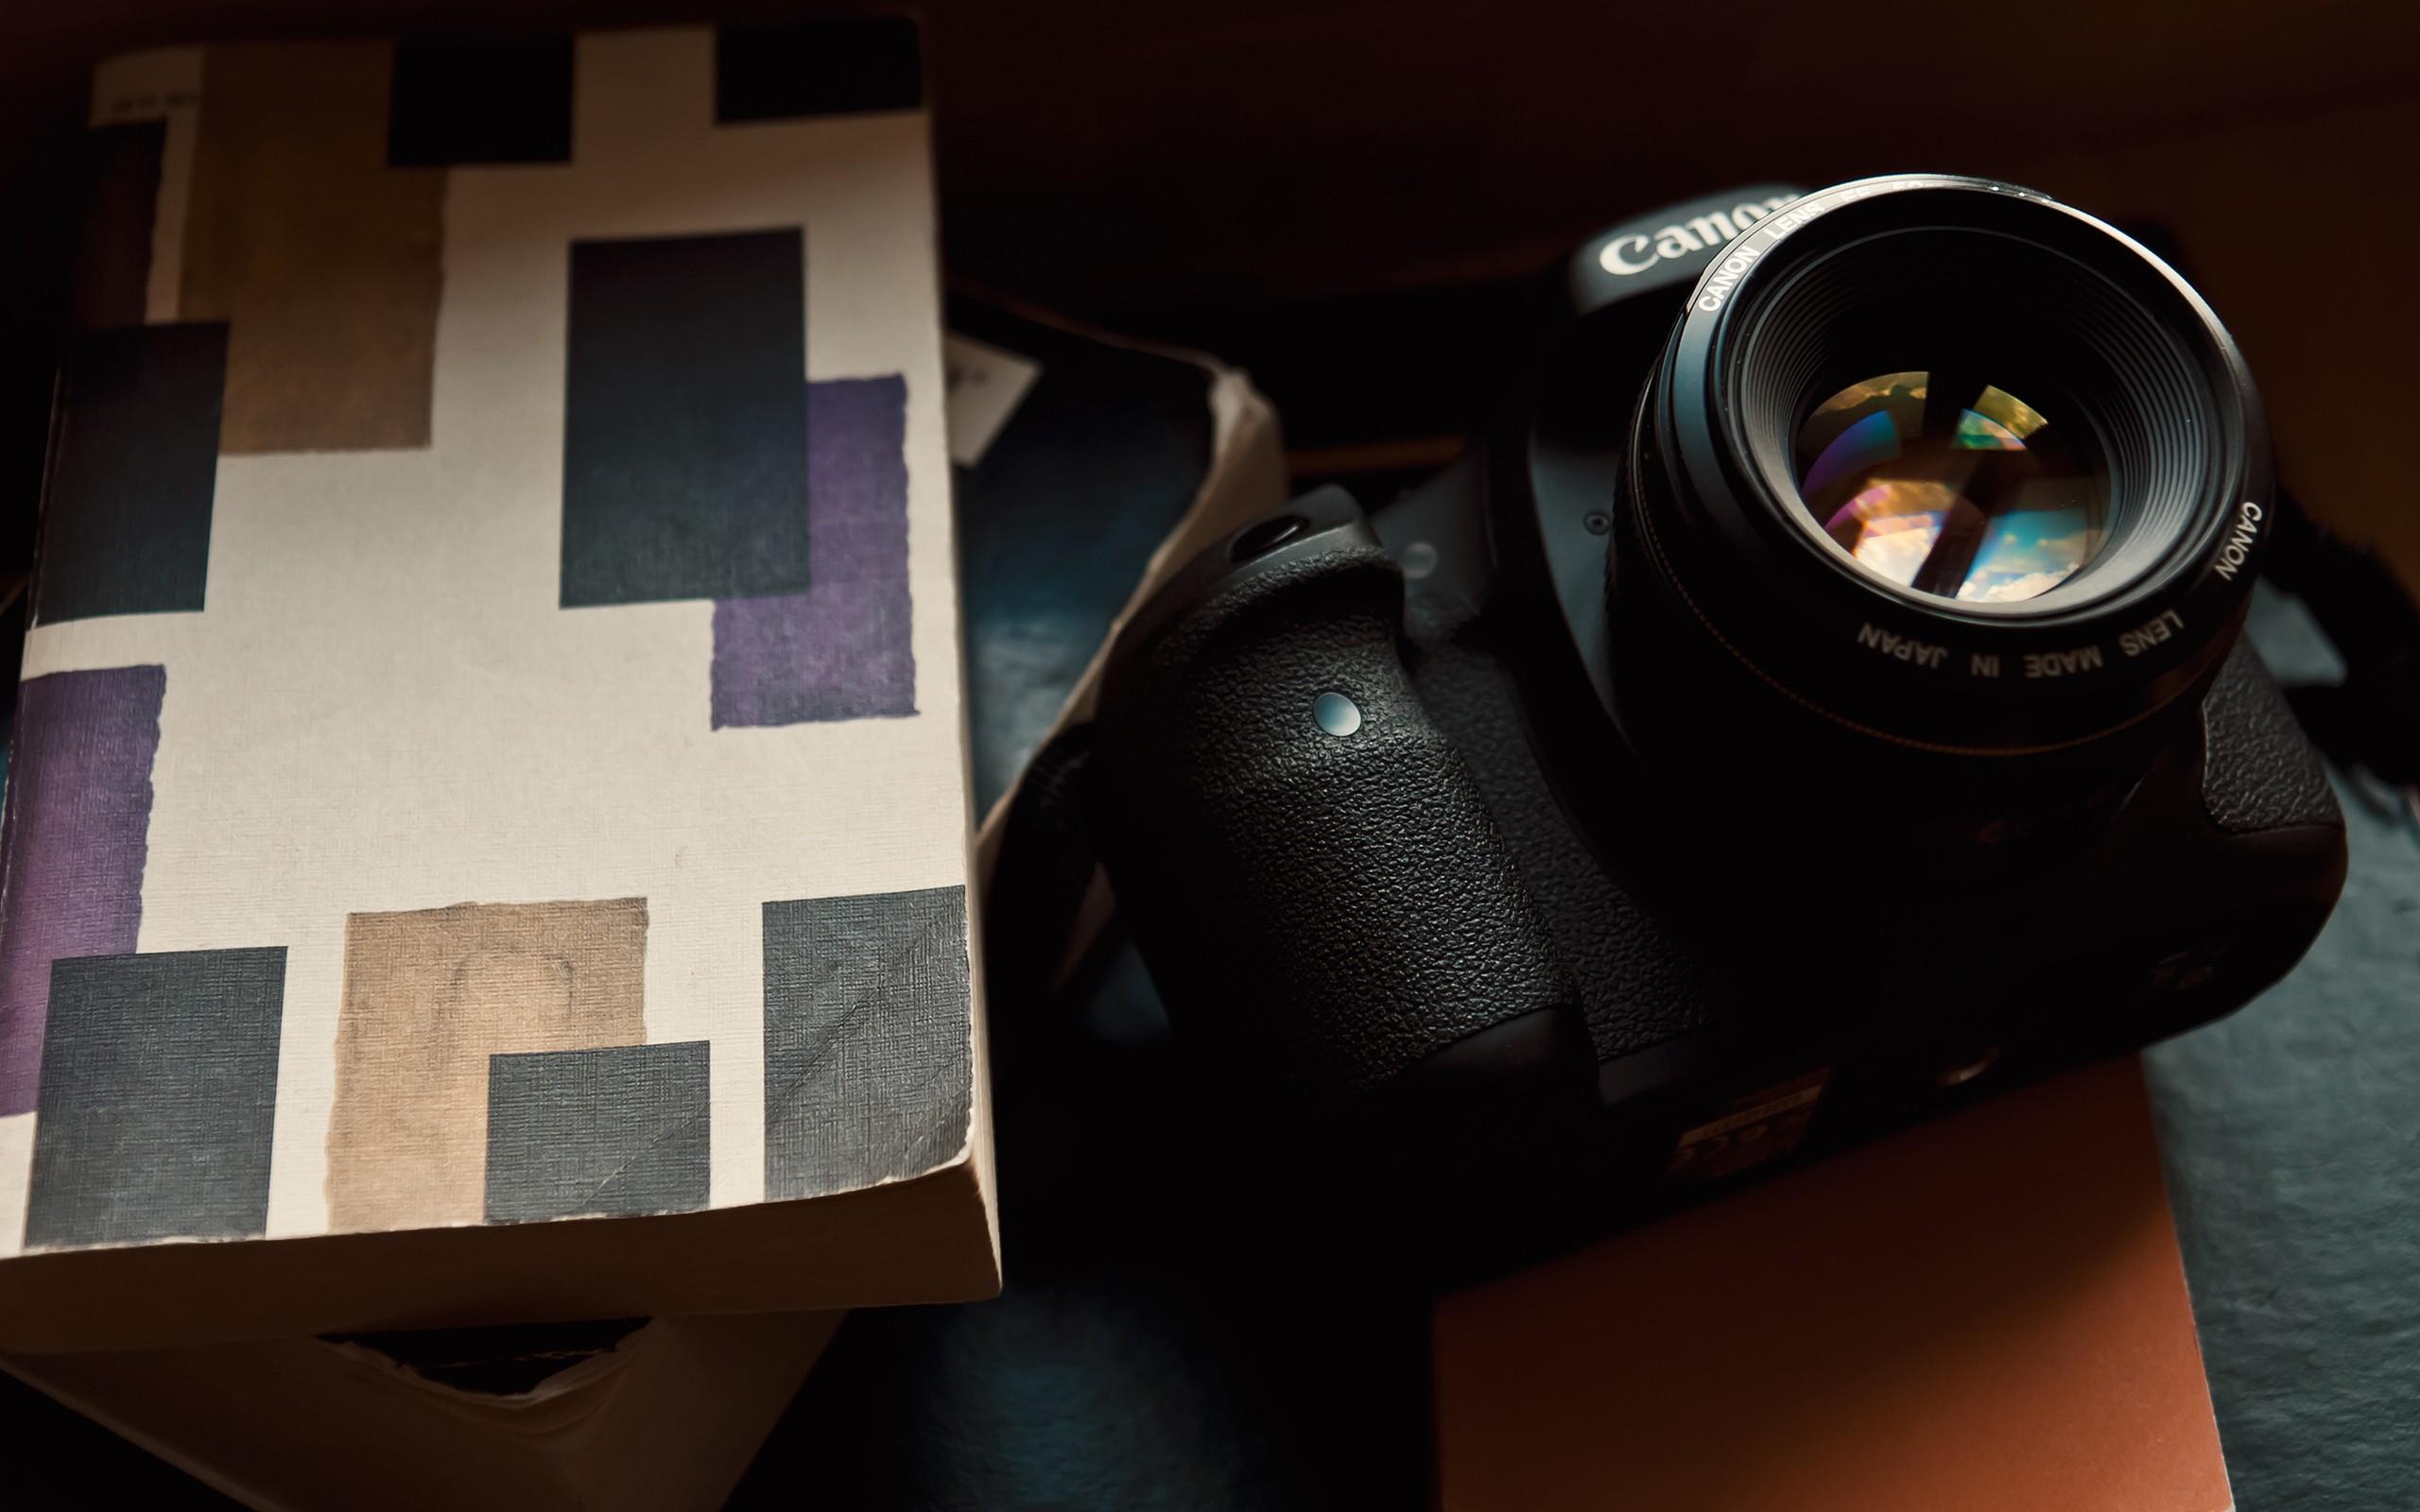 Canon DSLR Kamera Hintergrundbilder Canon DSLR Kamera frei fotos 2560x1600